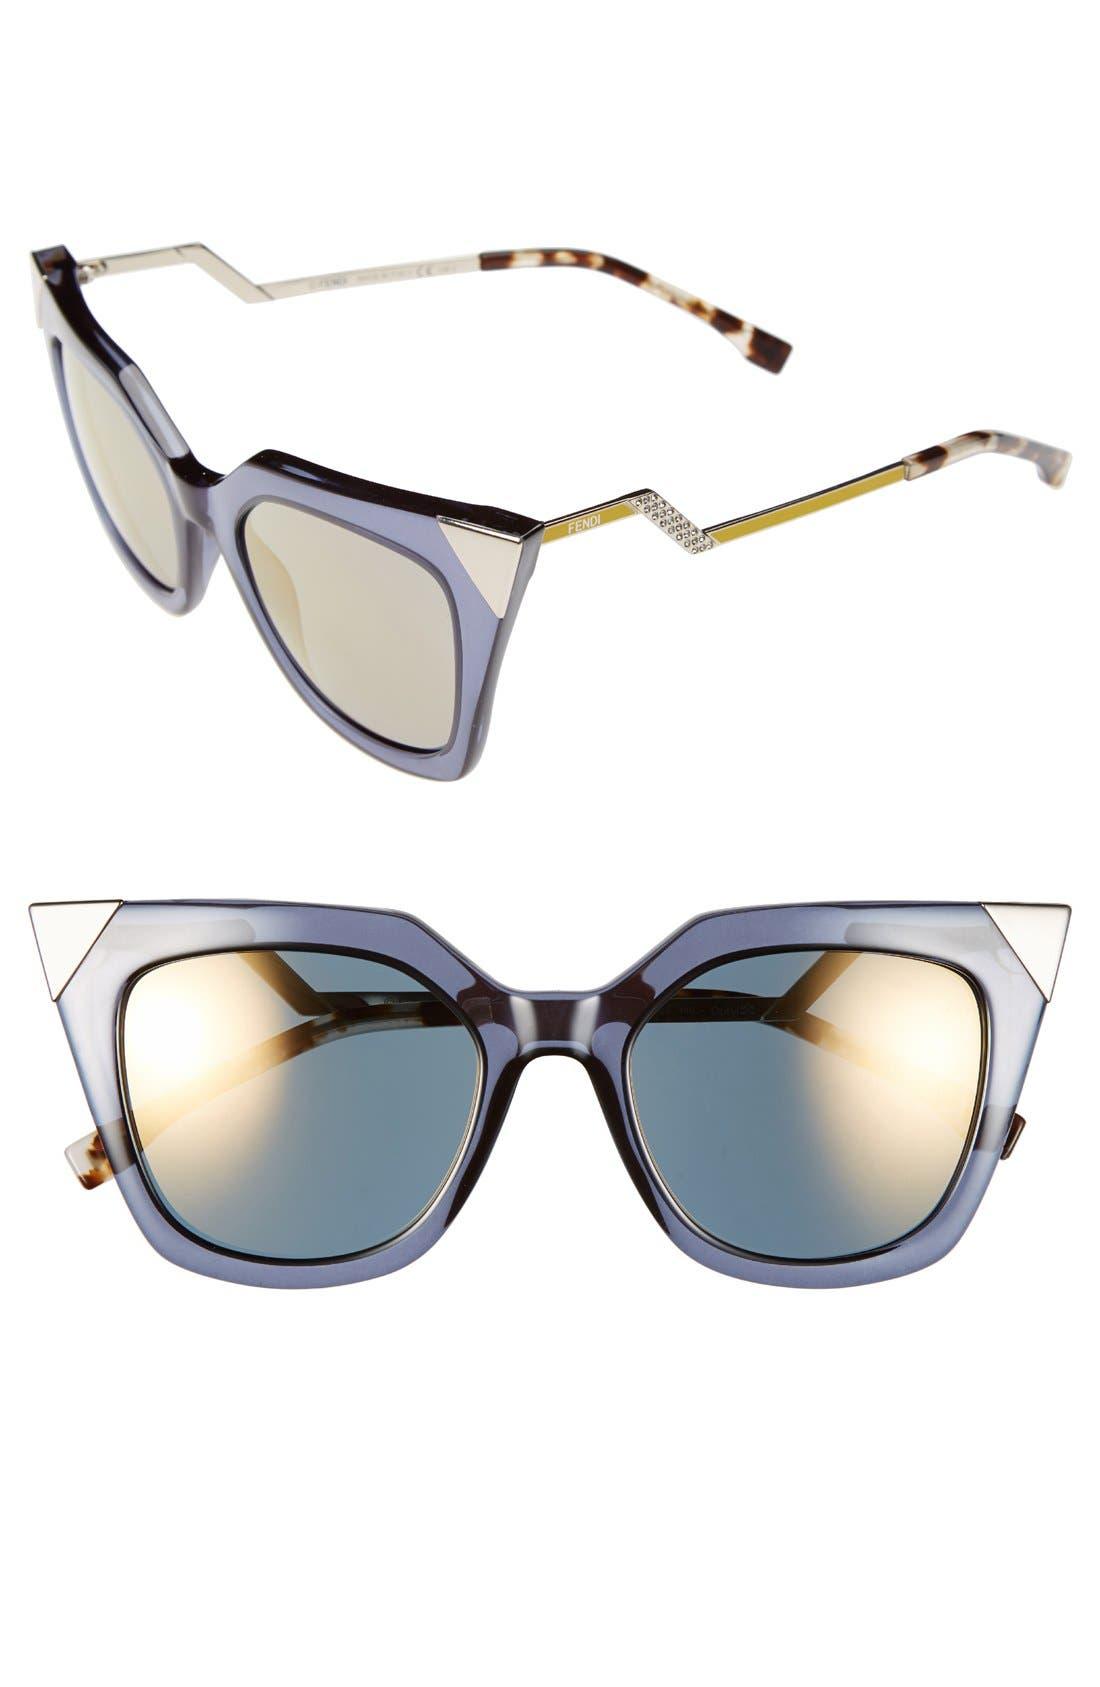 52mm Cat Eye Sunglasses,                             Main thumbnail 6, color,